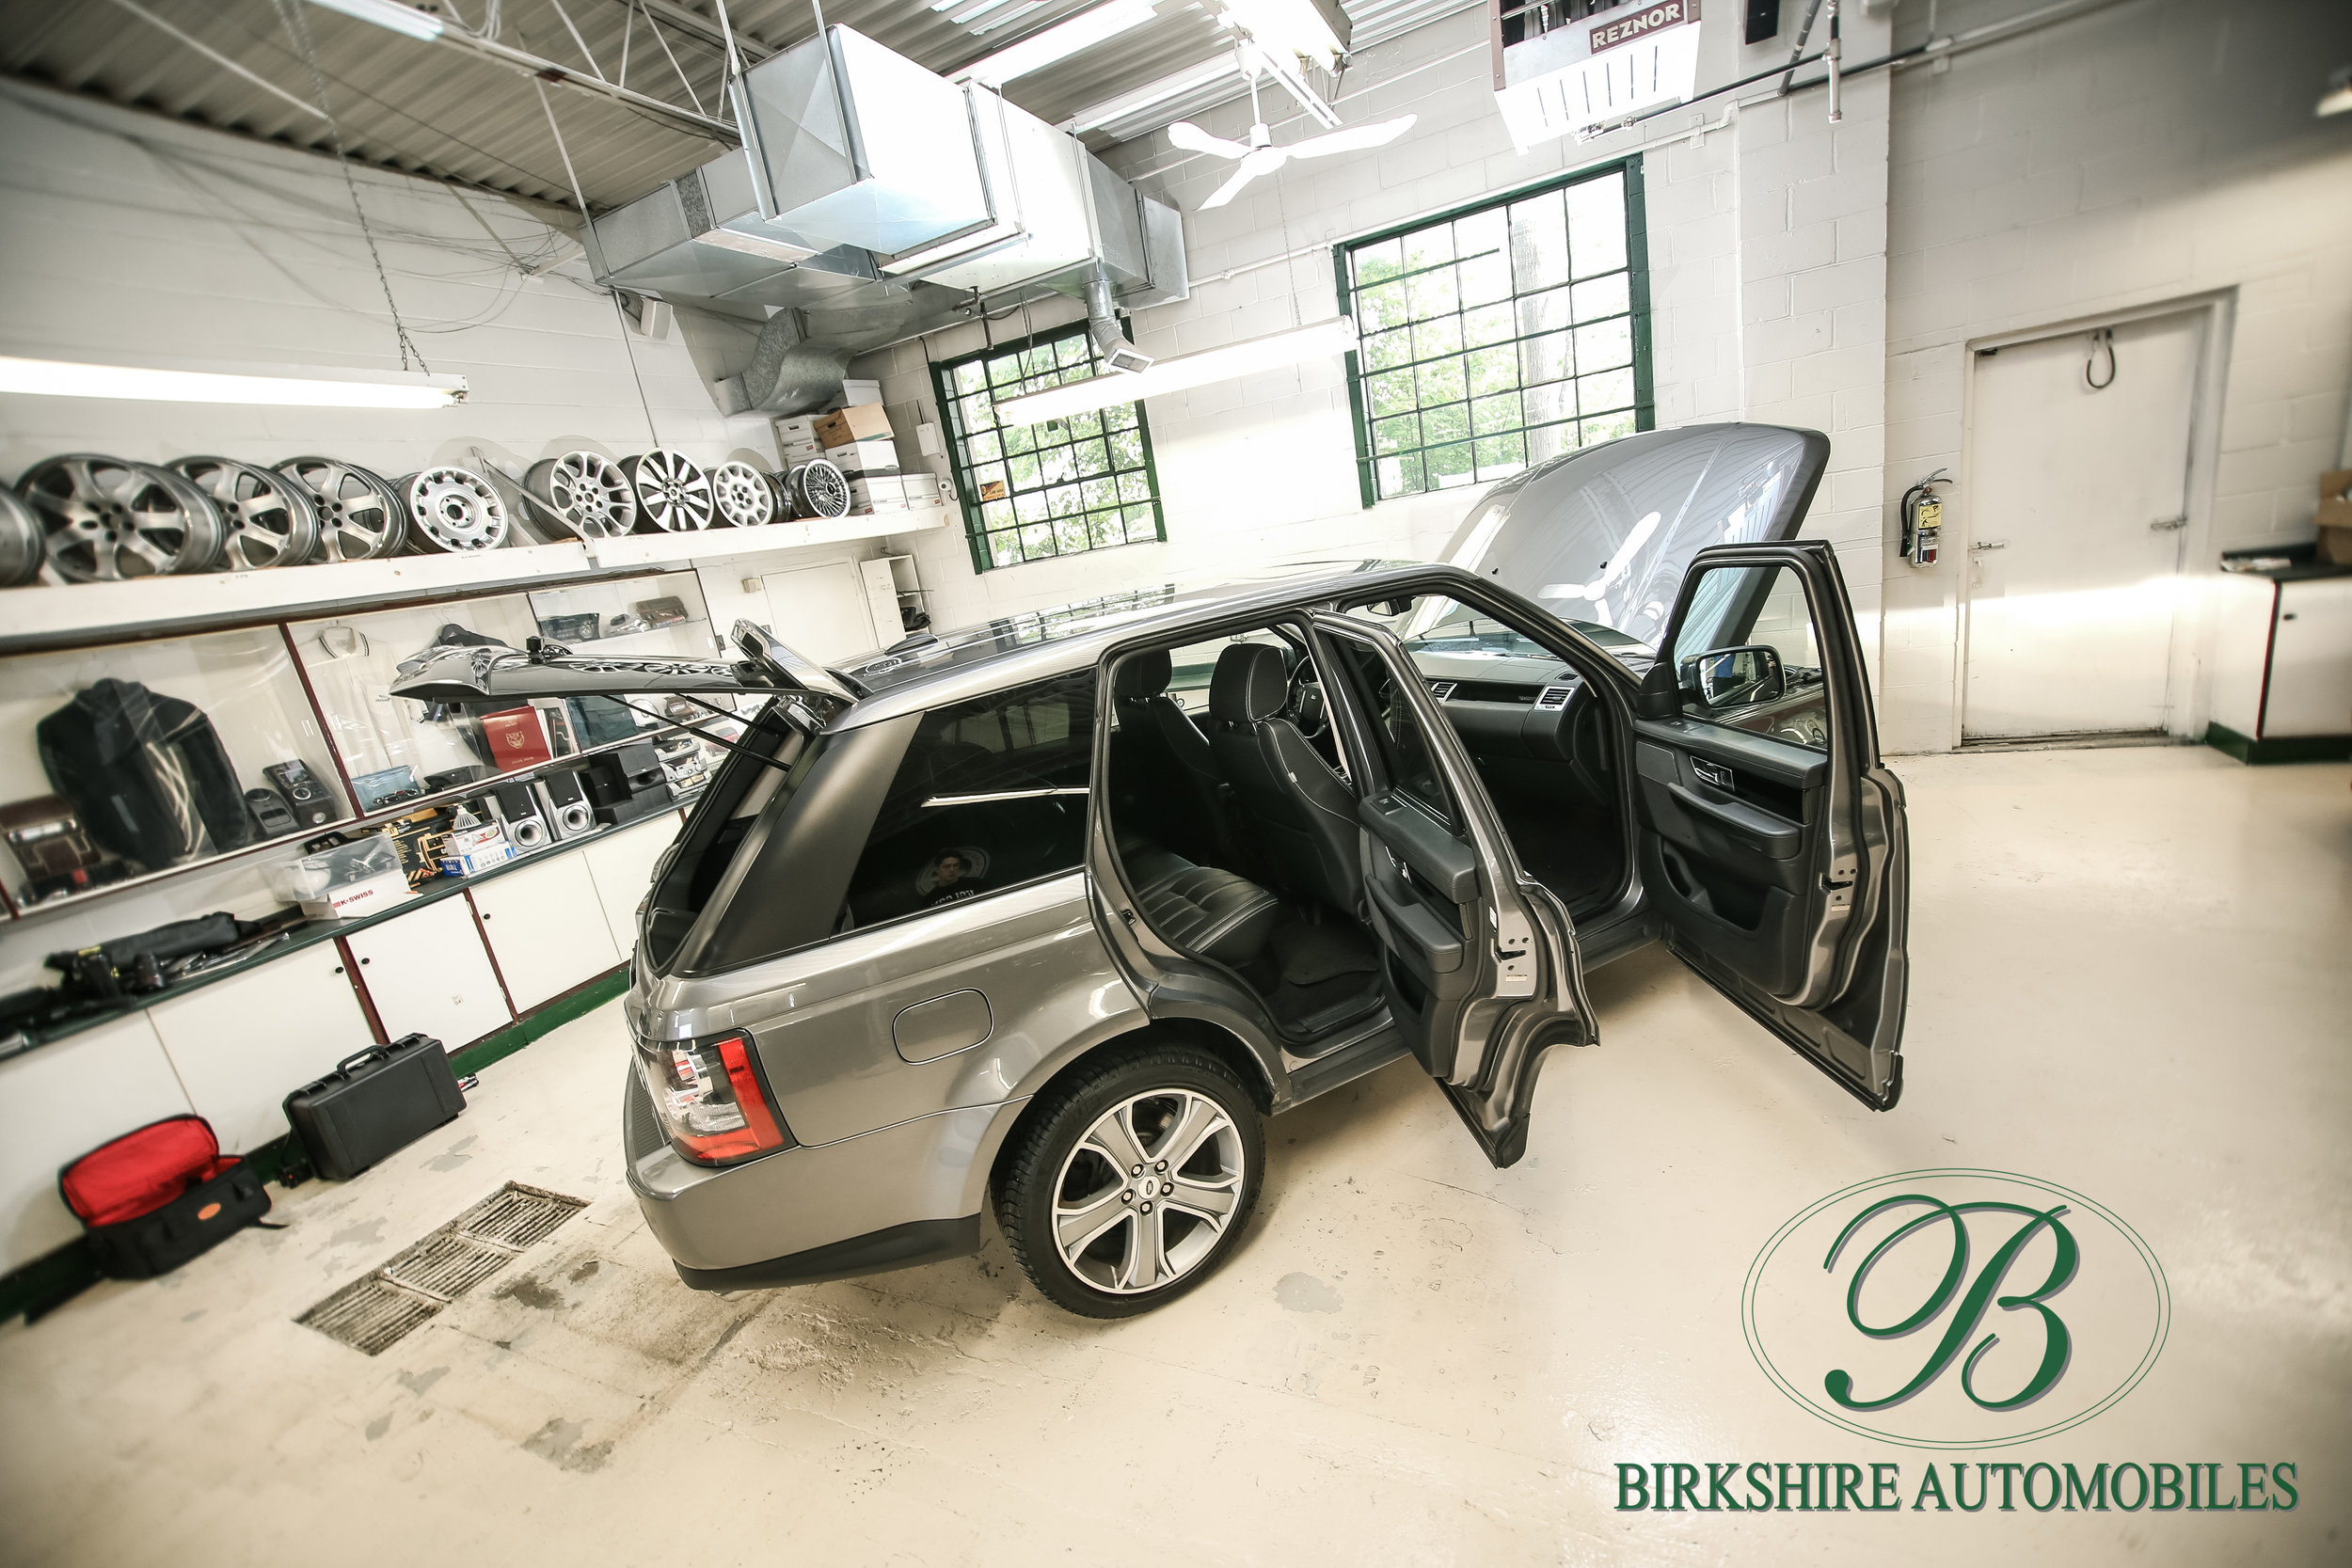 Birkshire Automobiles-48.jpg